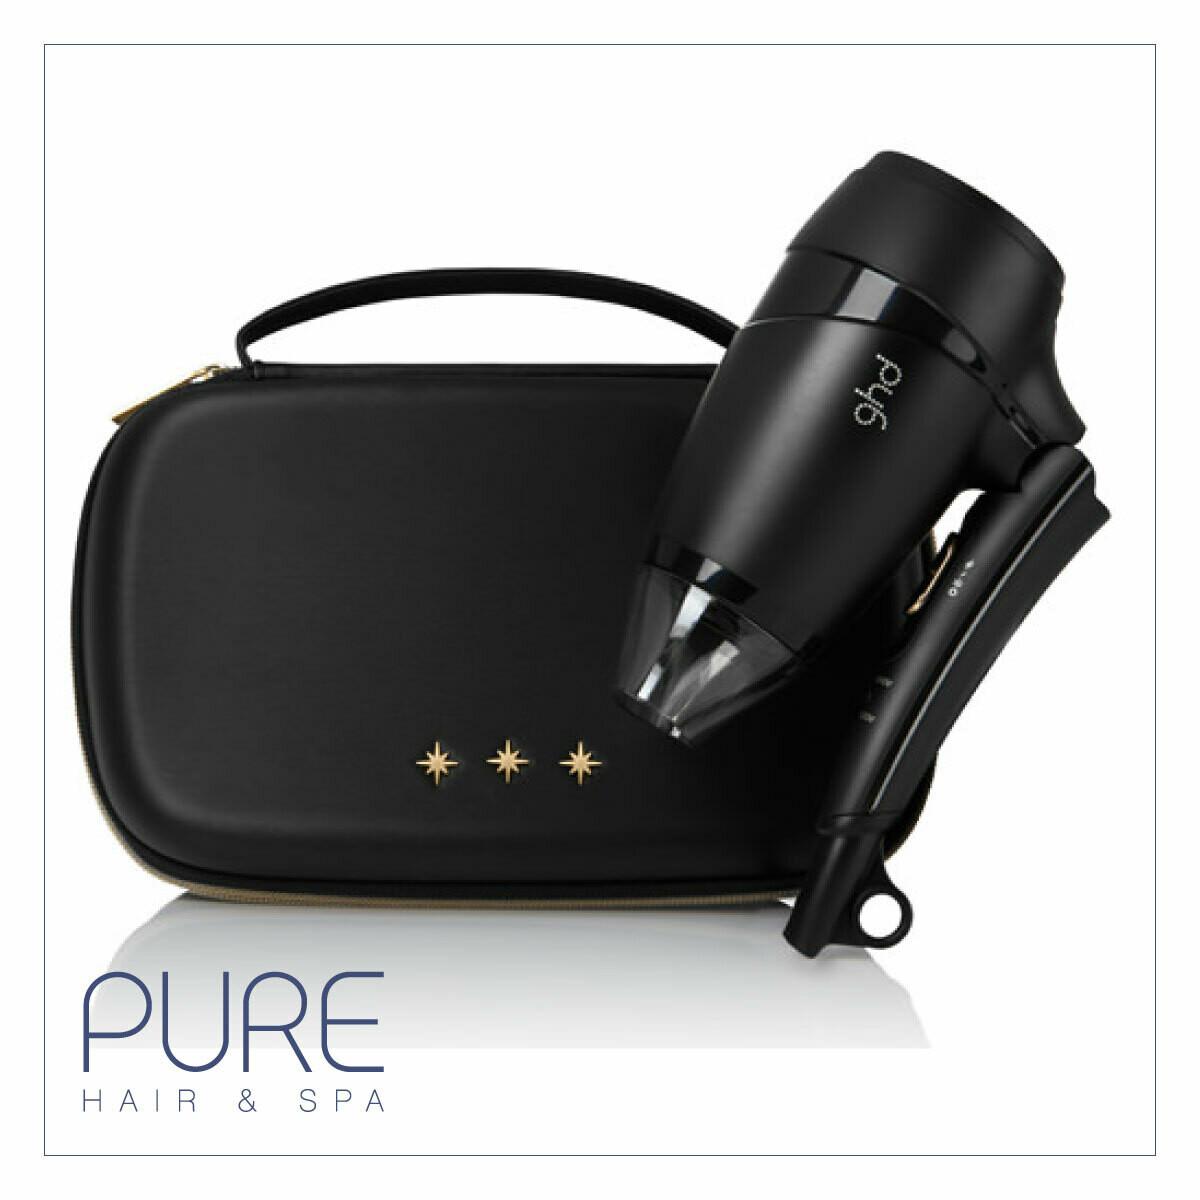 ghd flight® travel hair dryer gift set